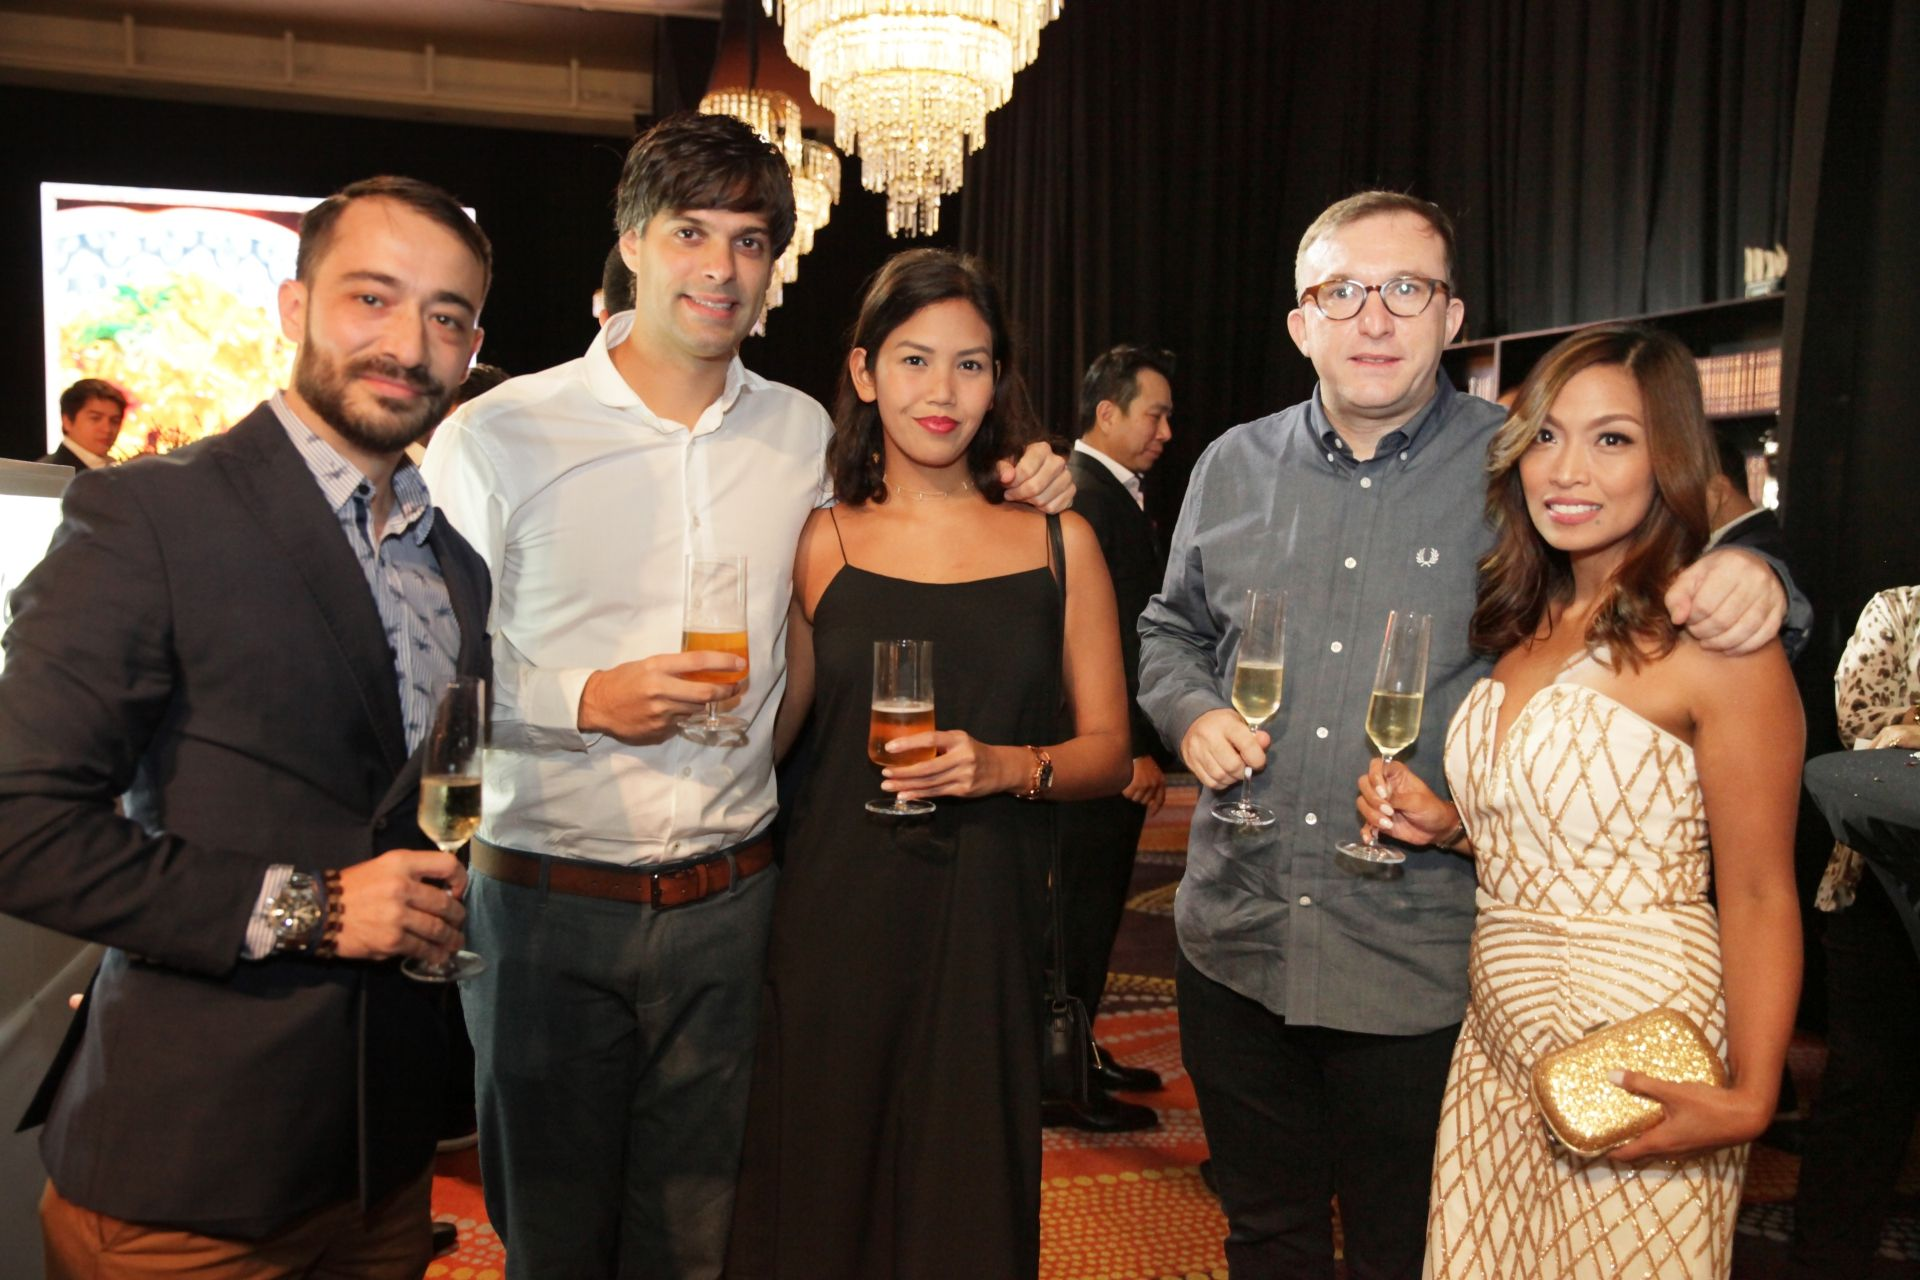 Dani Aliaga, Uri Singla and Jopet Reyes, Chele & Teri Gonzalez